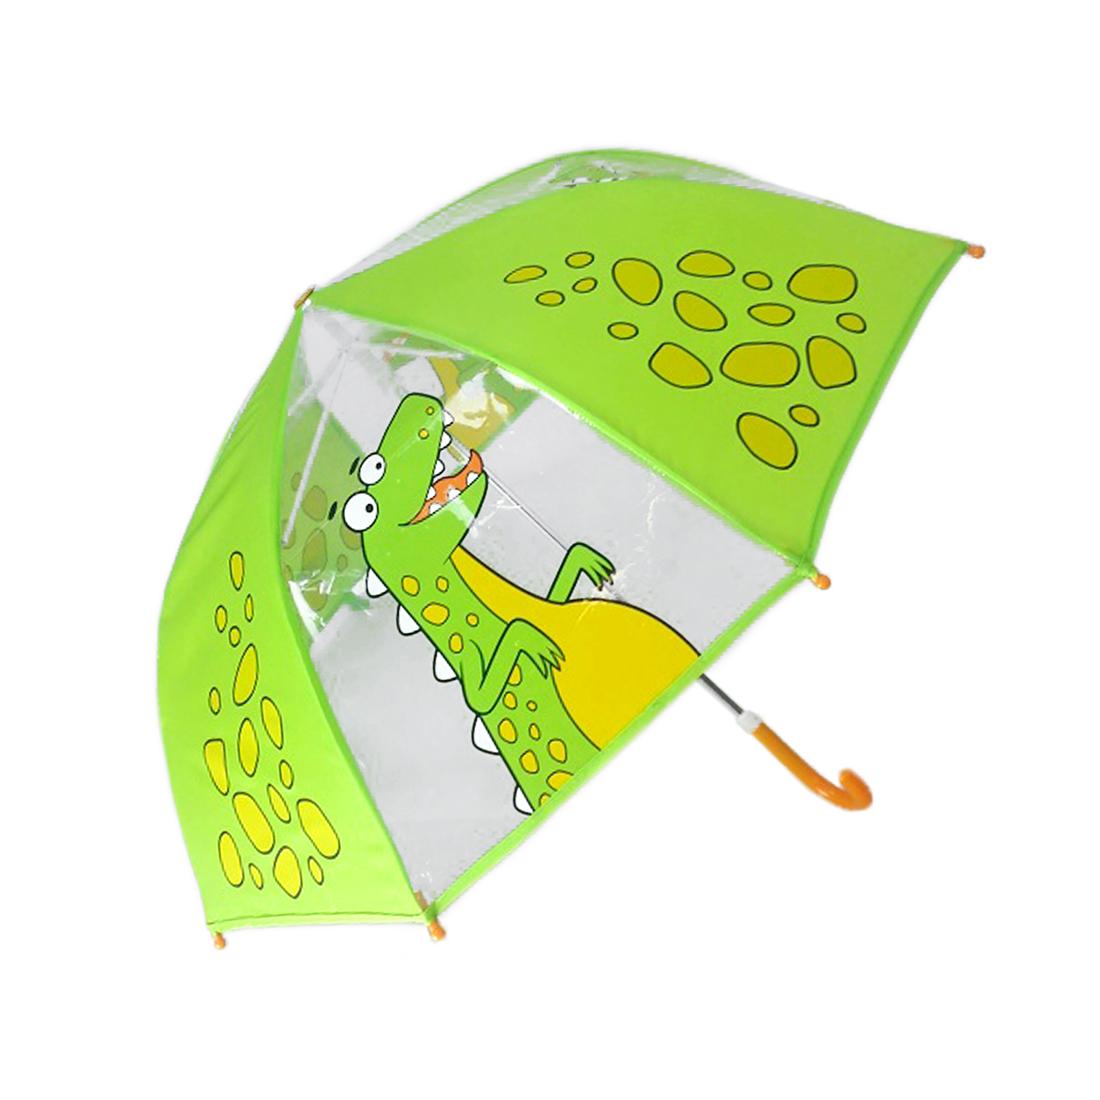 все цены на Зонт Mary Poppins Динозаврик 46 см онлайн